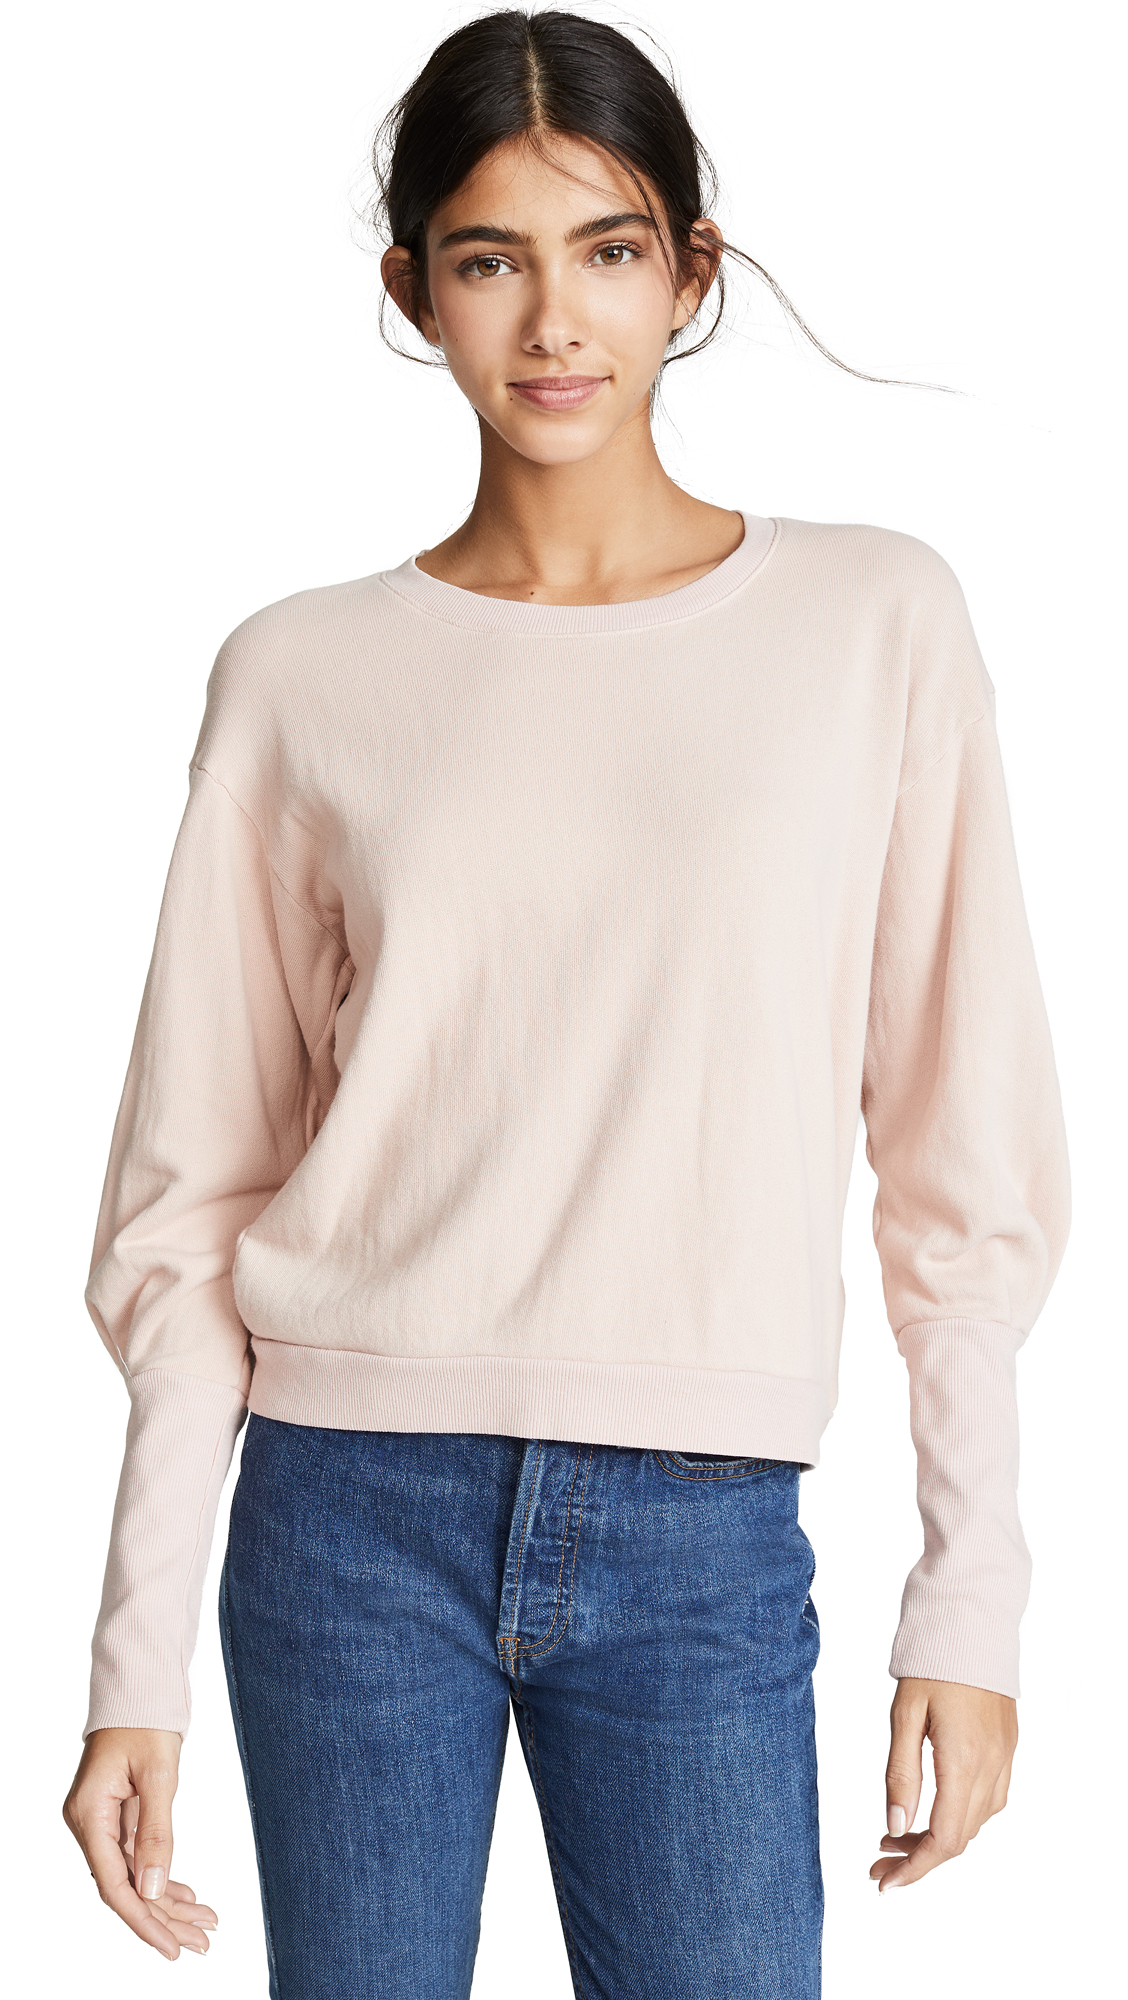 NATION LTD Coco Cuffed Sweatshirt in Pink Rose